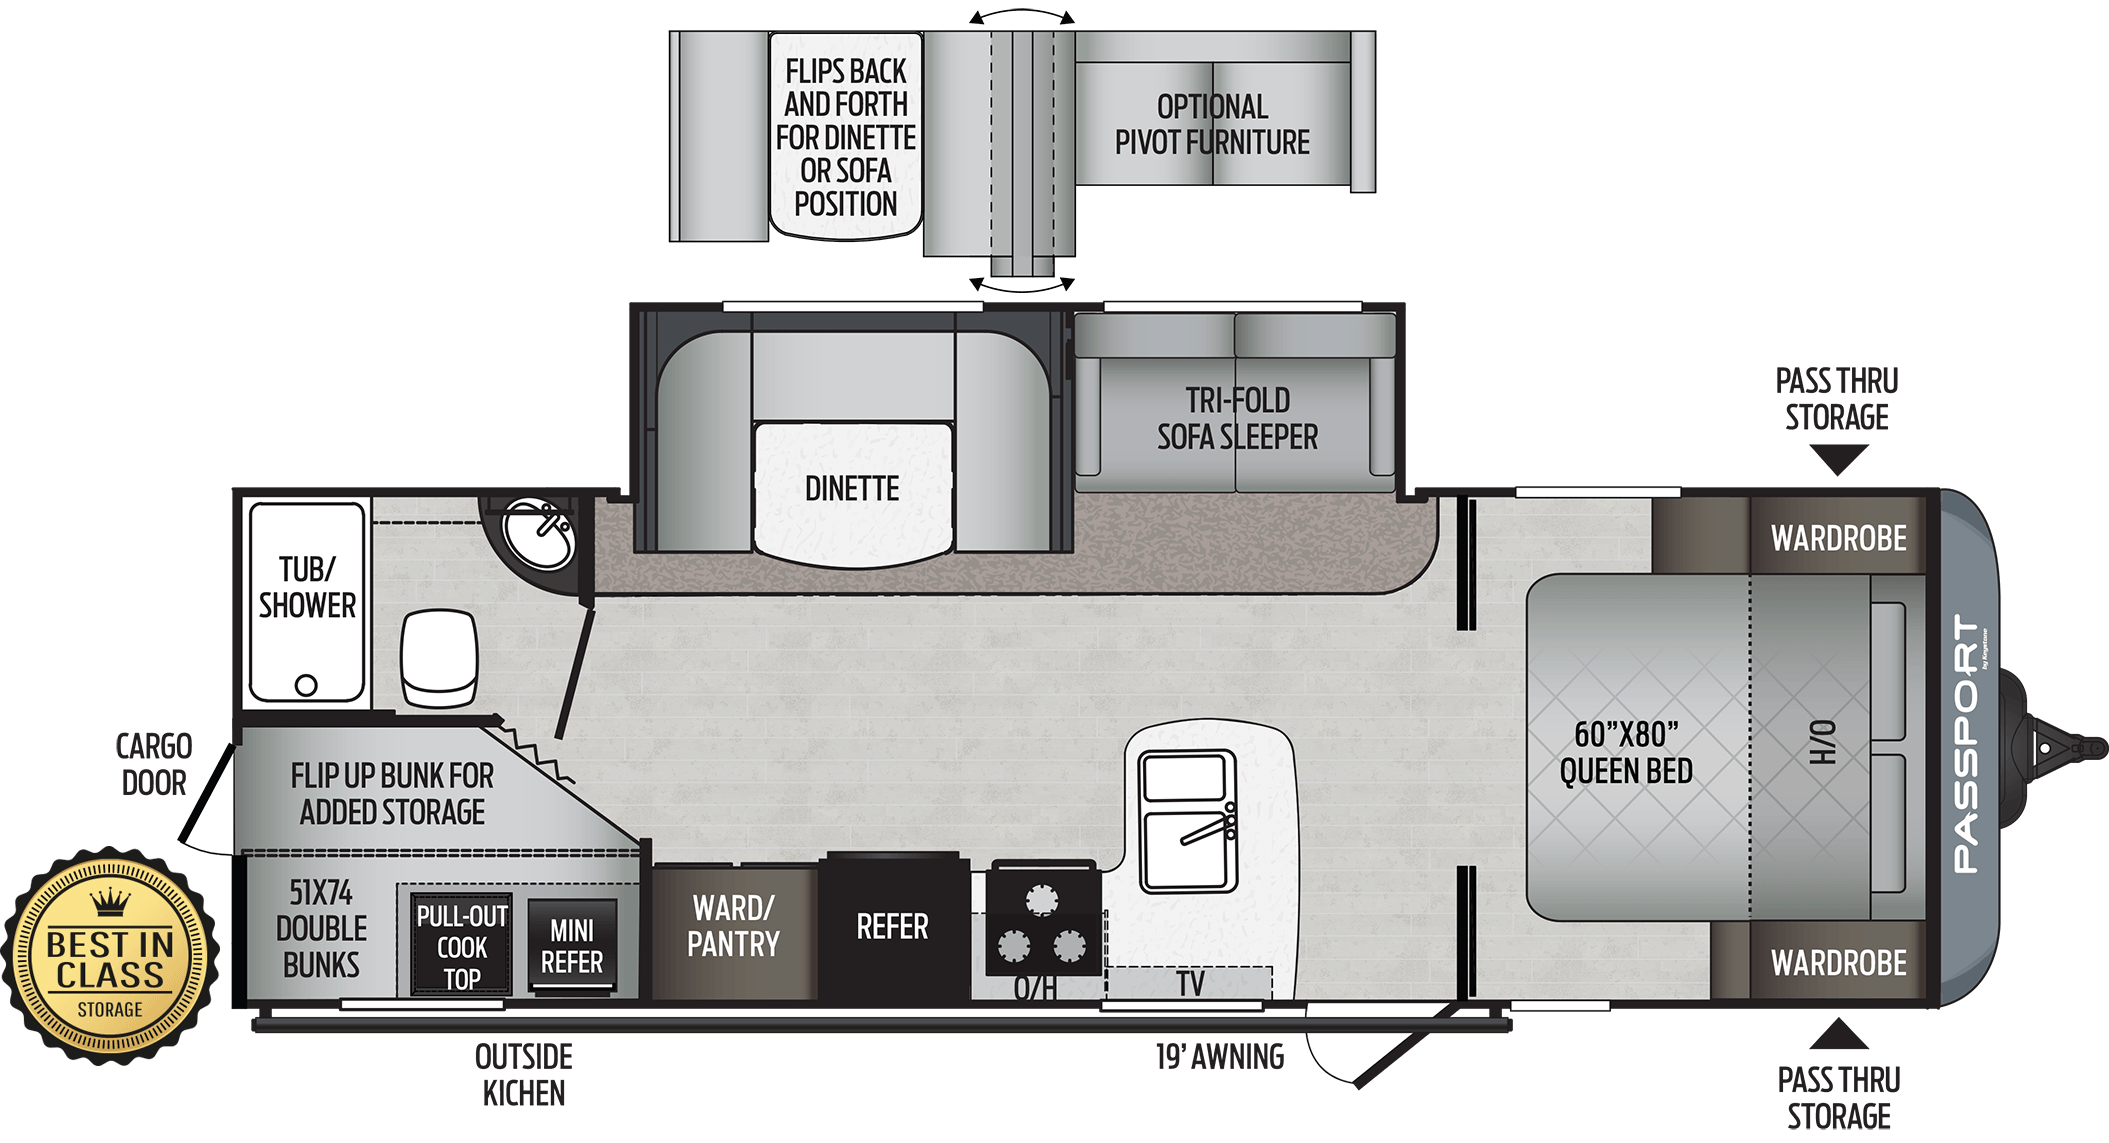 2021 KEYSTONE RV PASSPORT SL 268BH - PRE ORDER NOW!